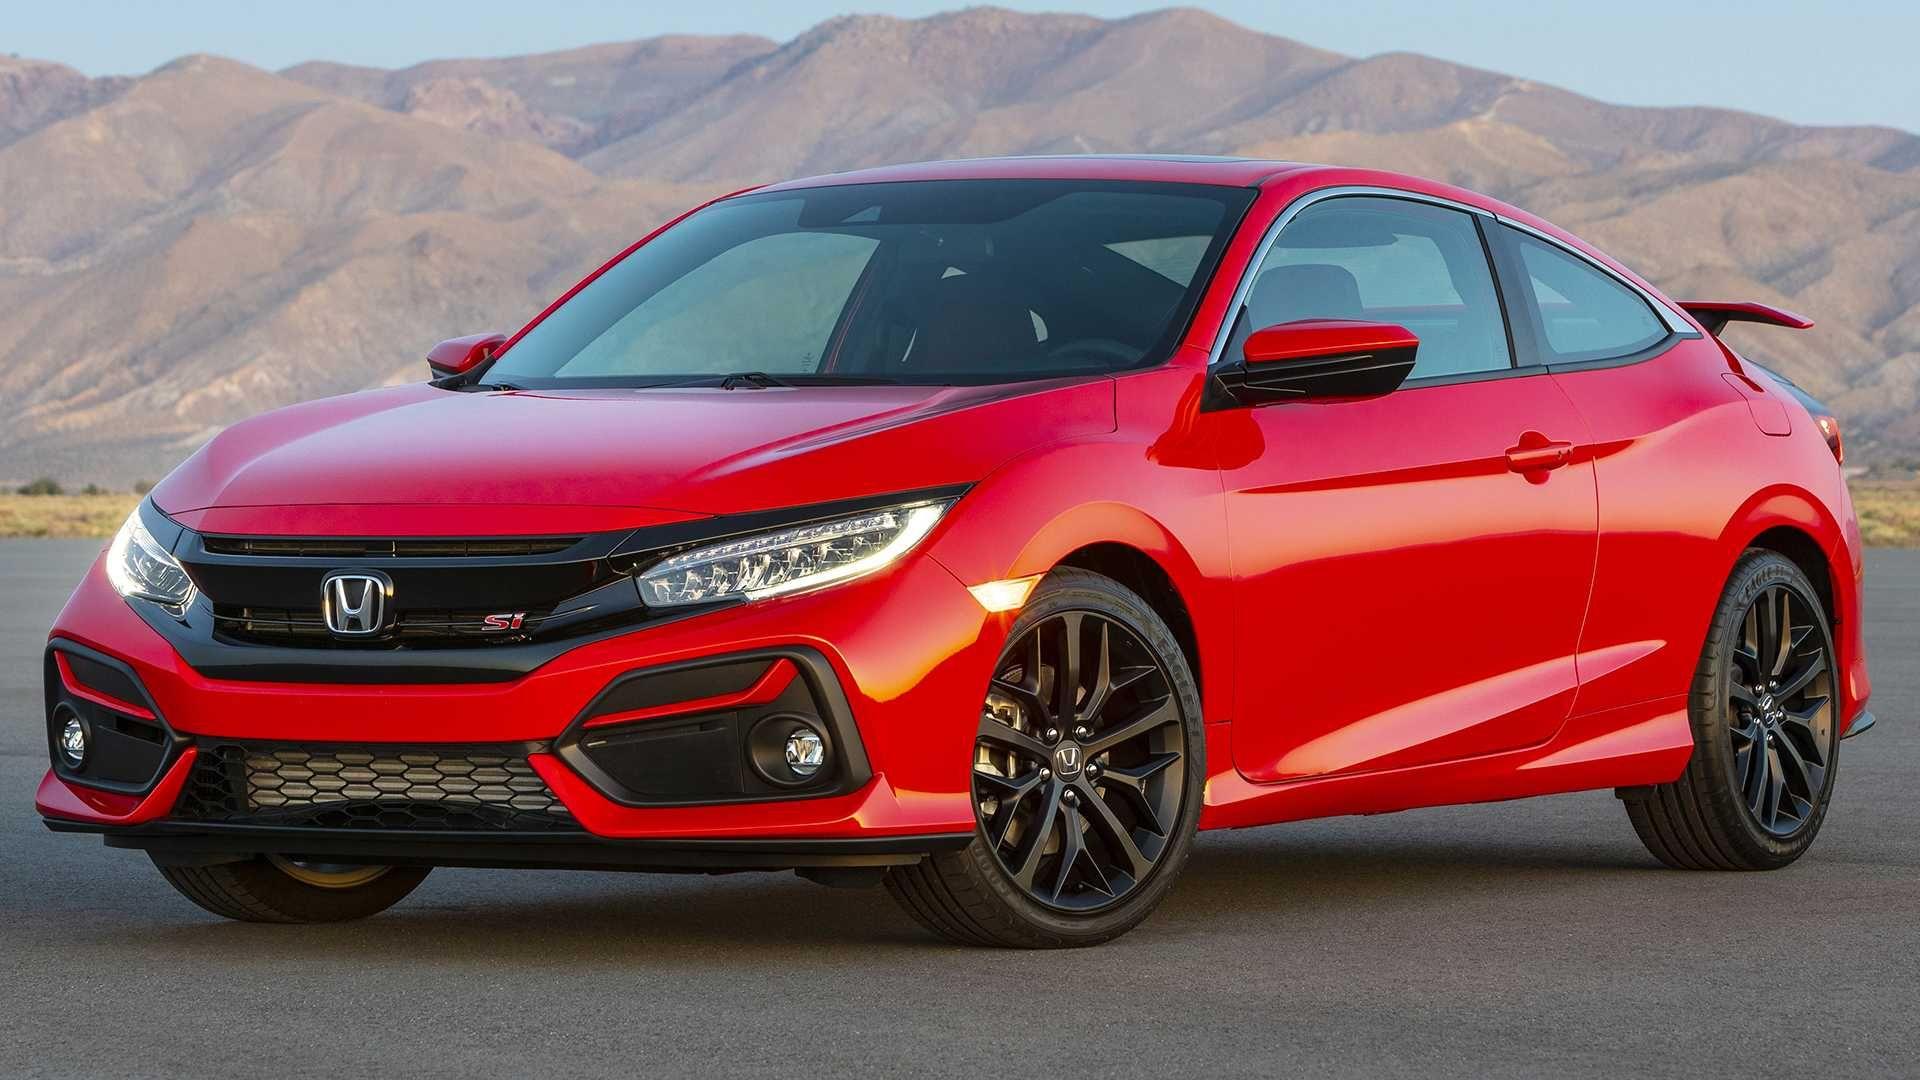 2020 Honda Civic Si Reviews cars honda civic